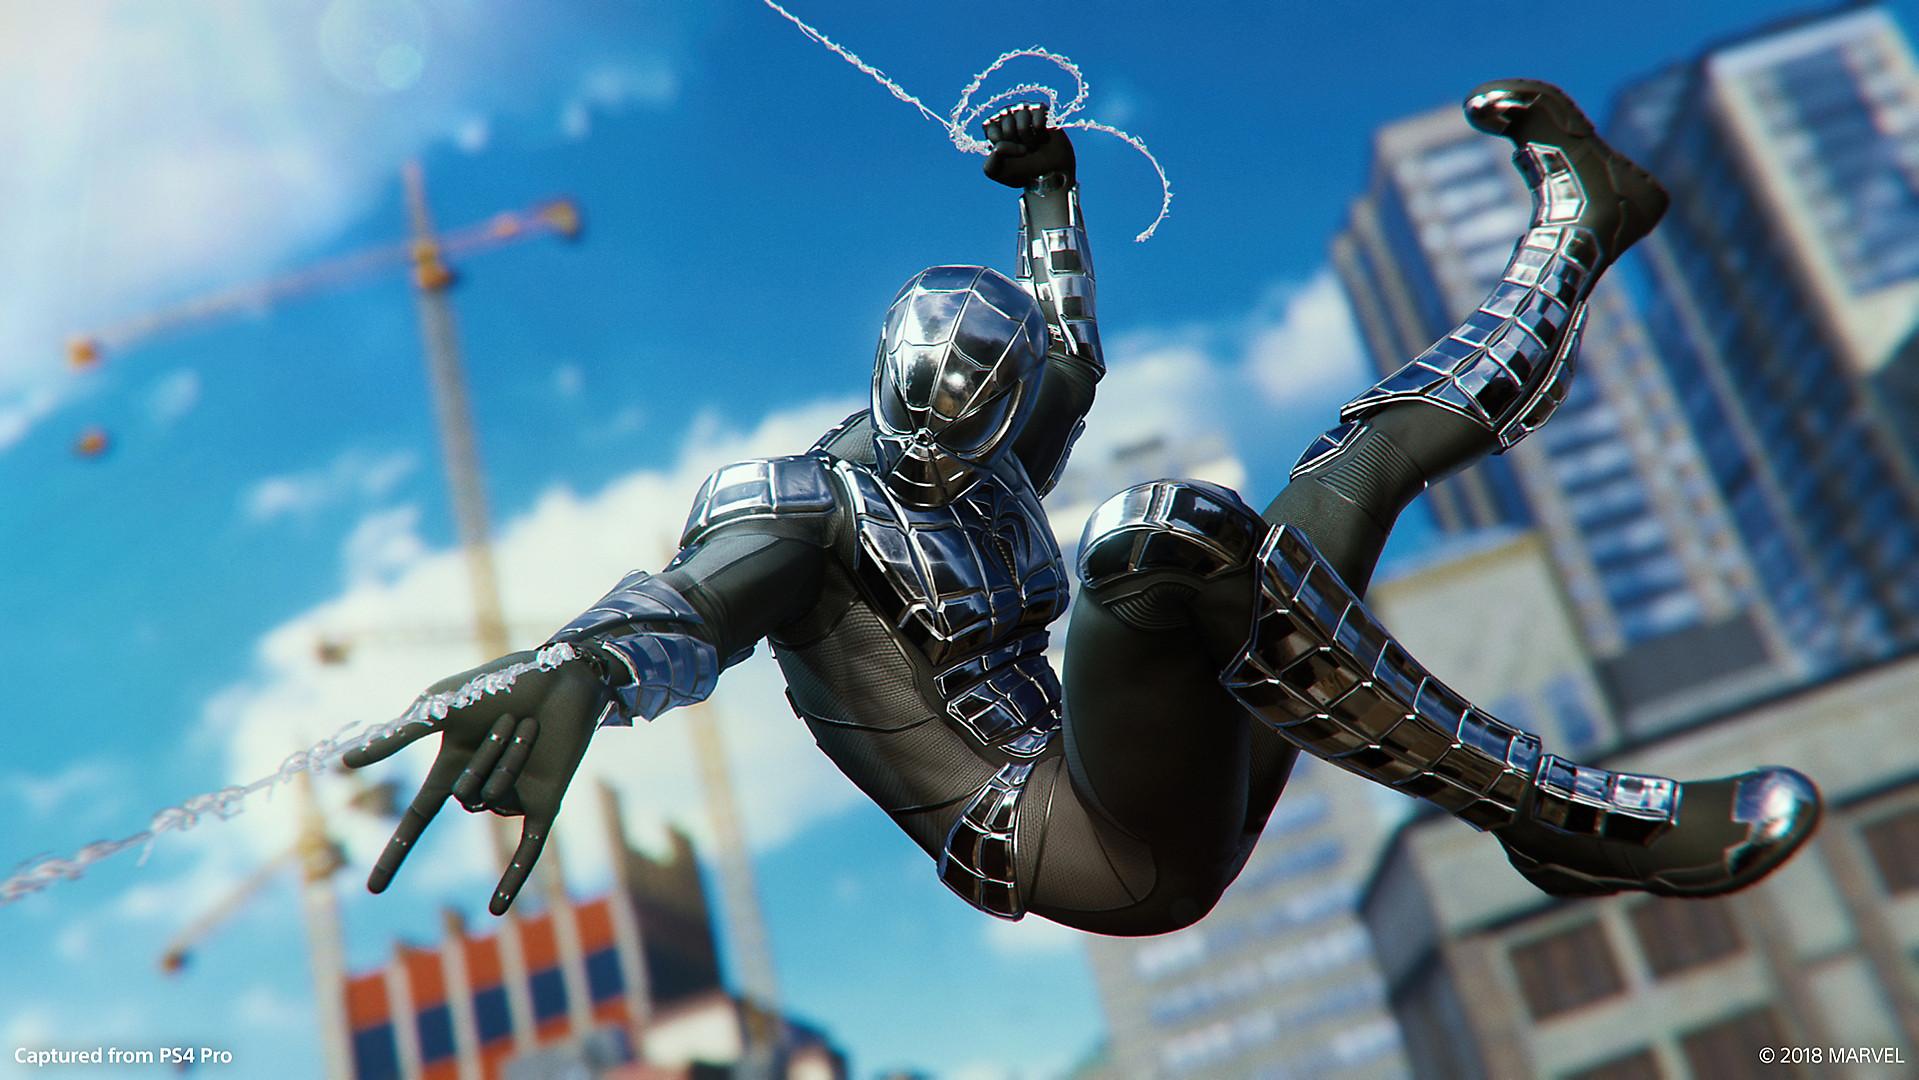 Spider-Armor MK1